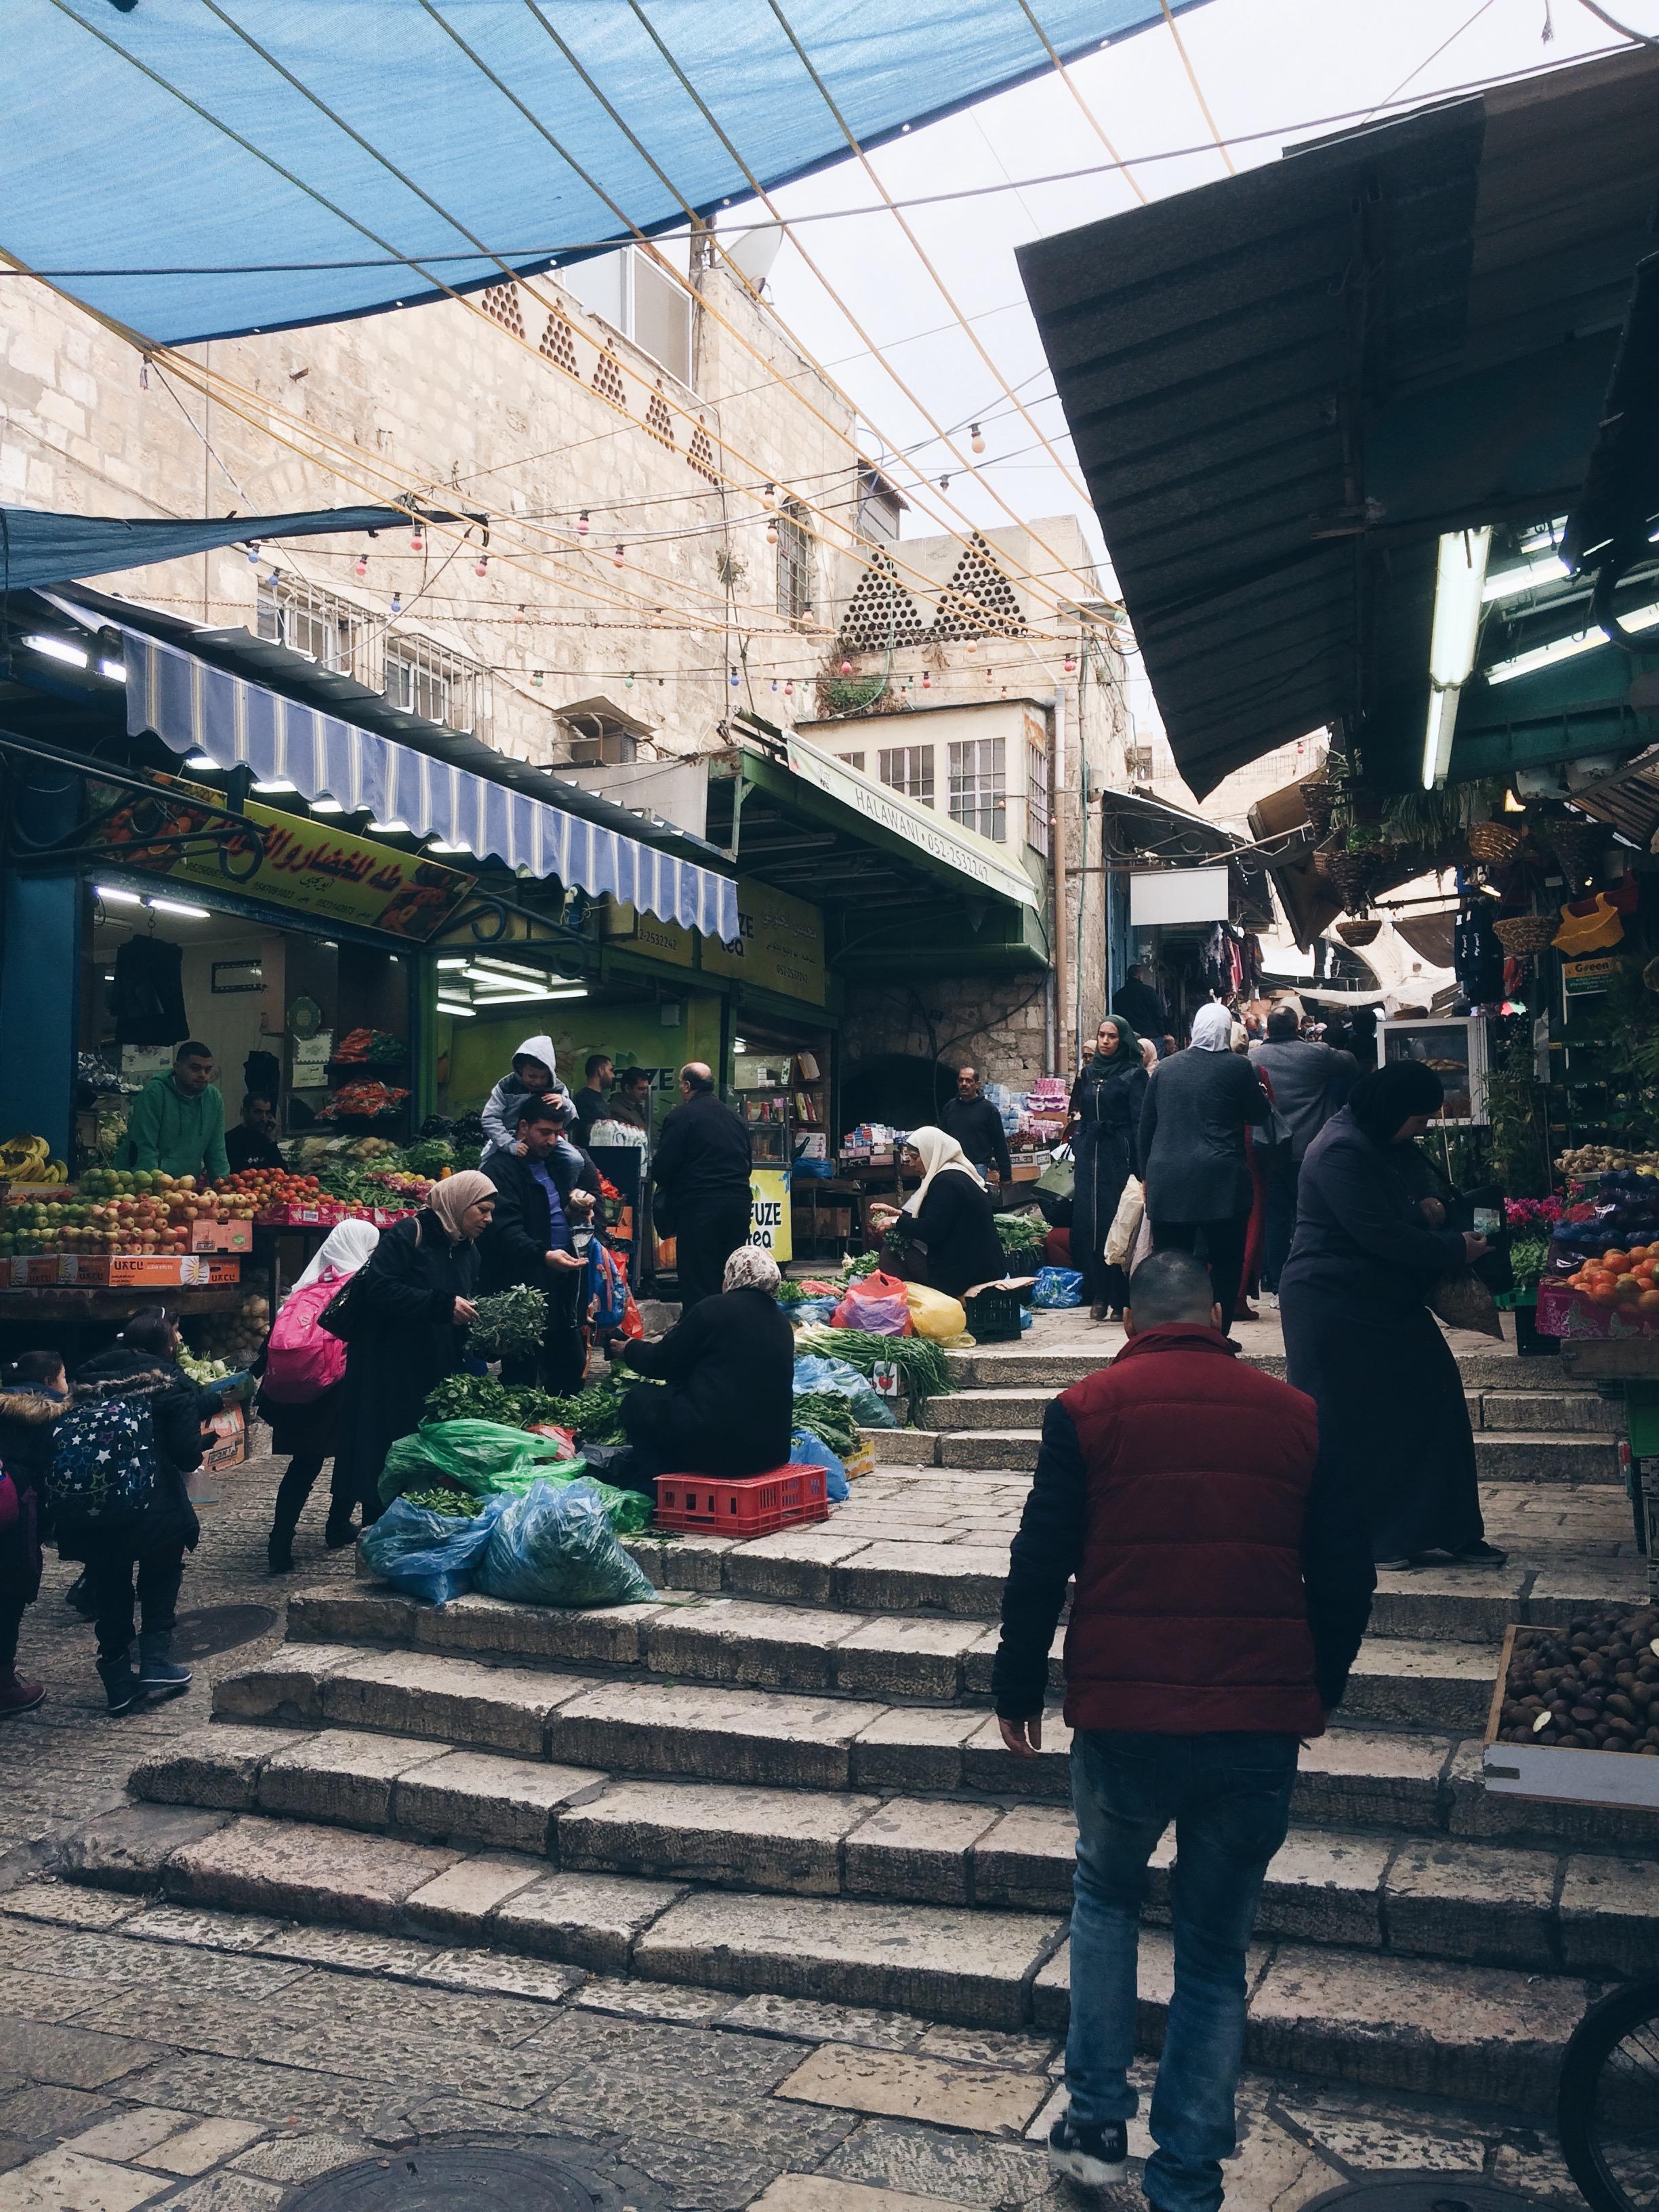 Izrael a Jordánsko aneb 6 plus 1 den na Blízkém východě vol. 2/2